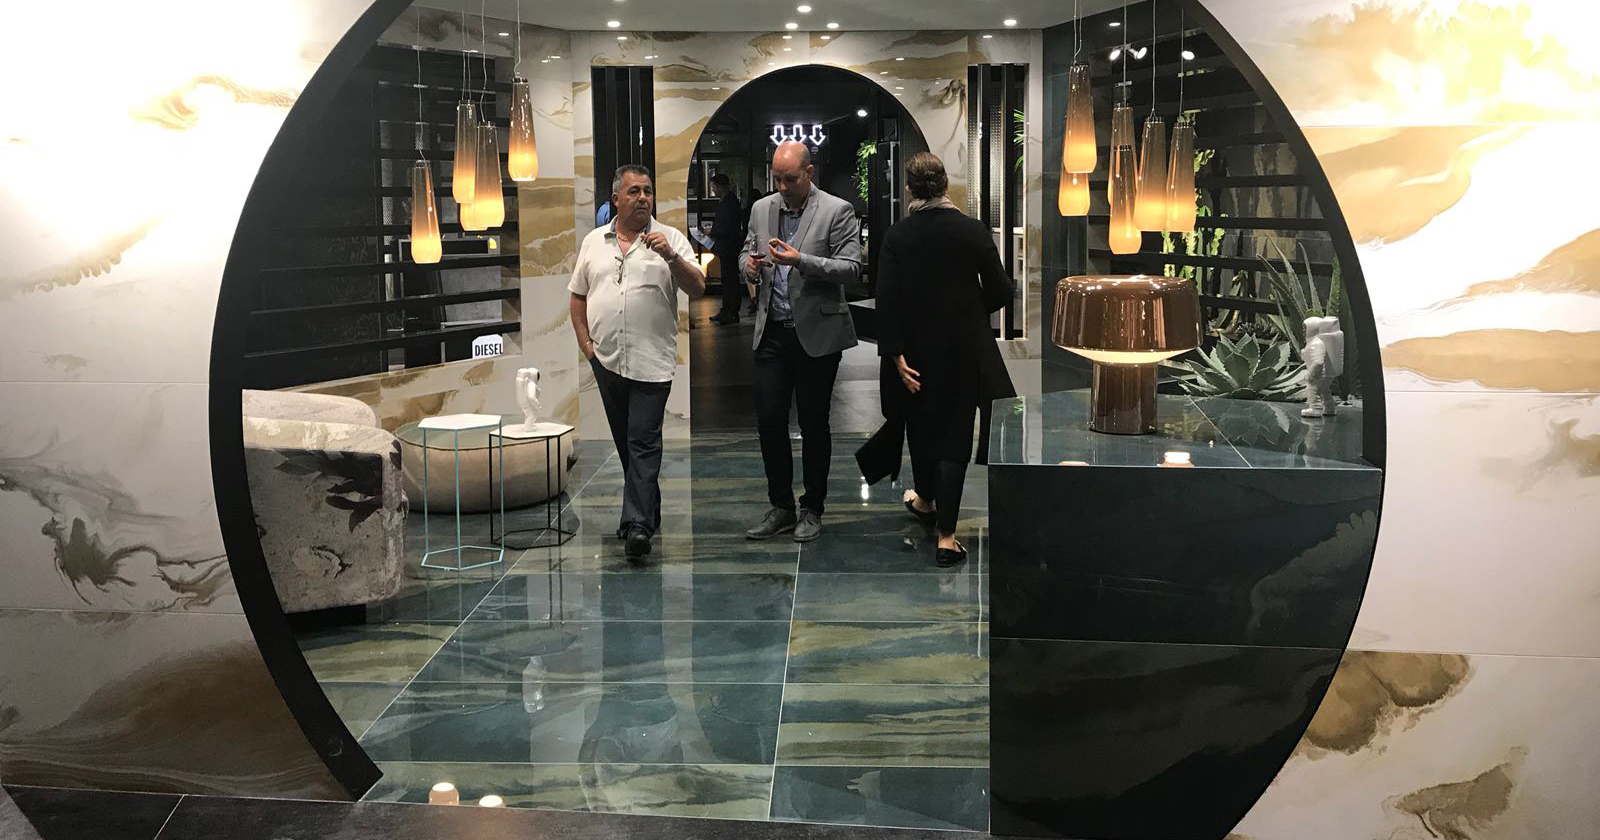 Cersaie-2018-Bologna-arredobagno-pavimenti-addessi-design (4)